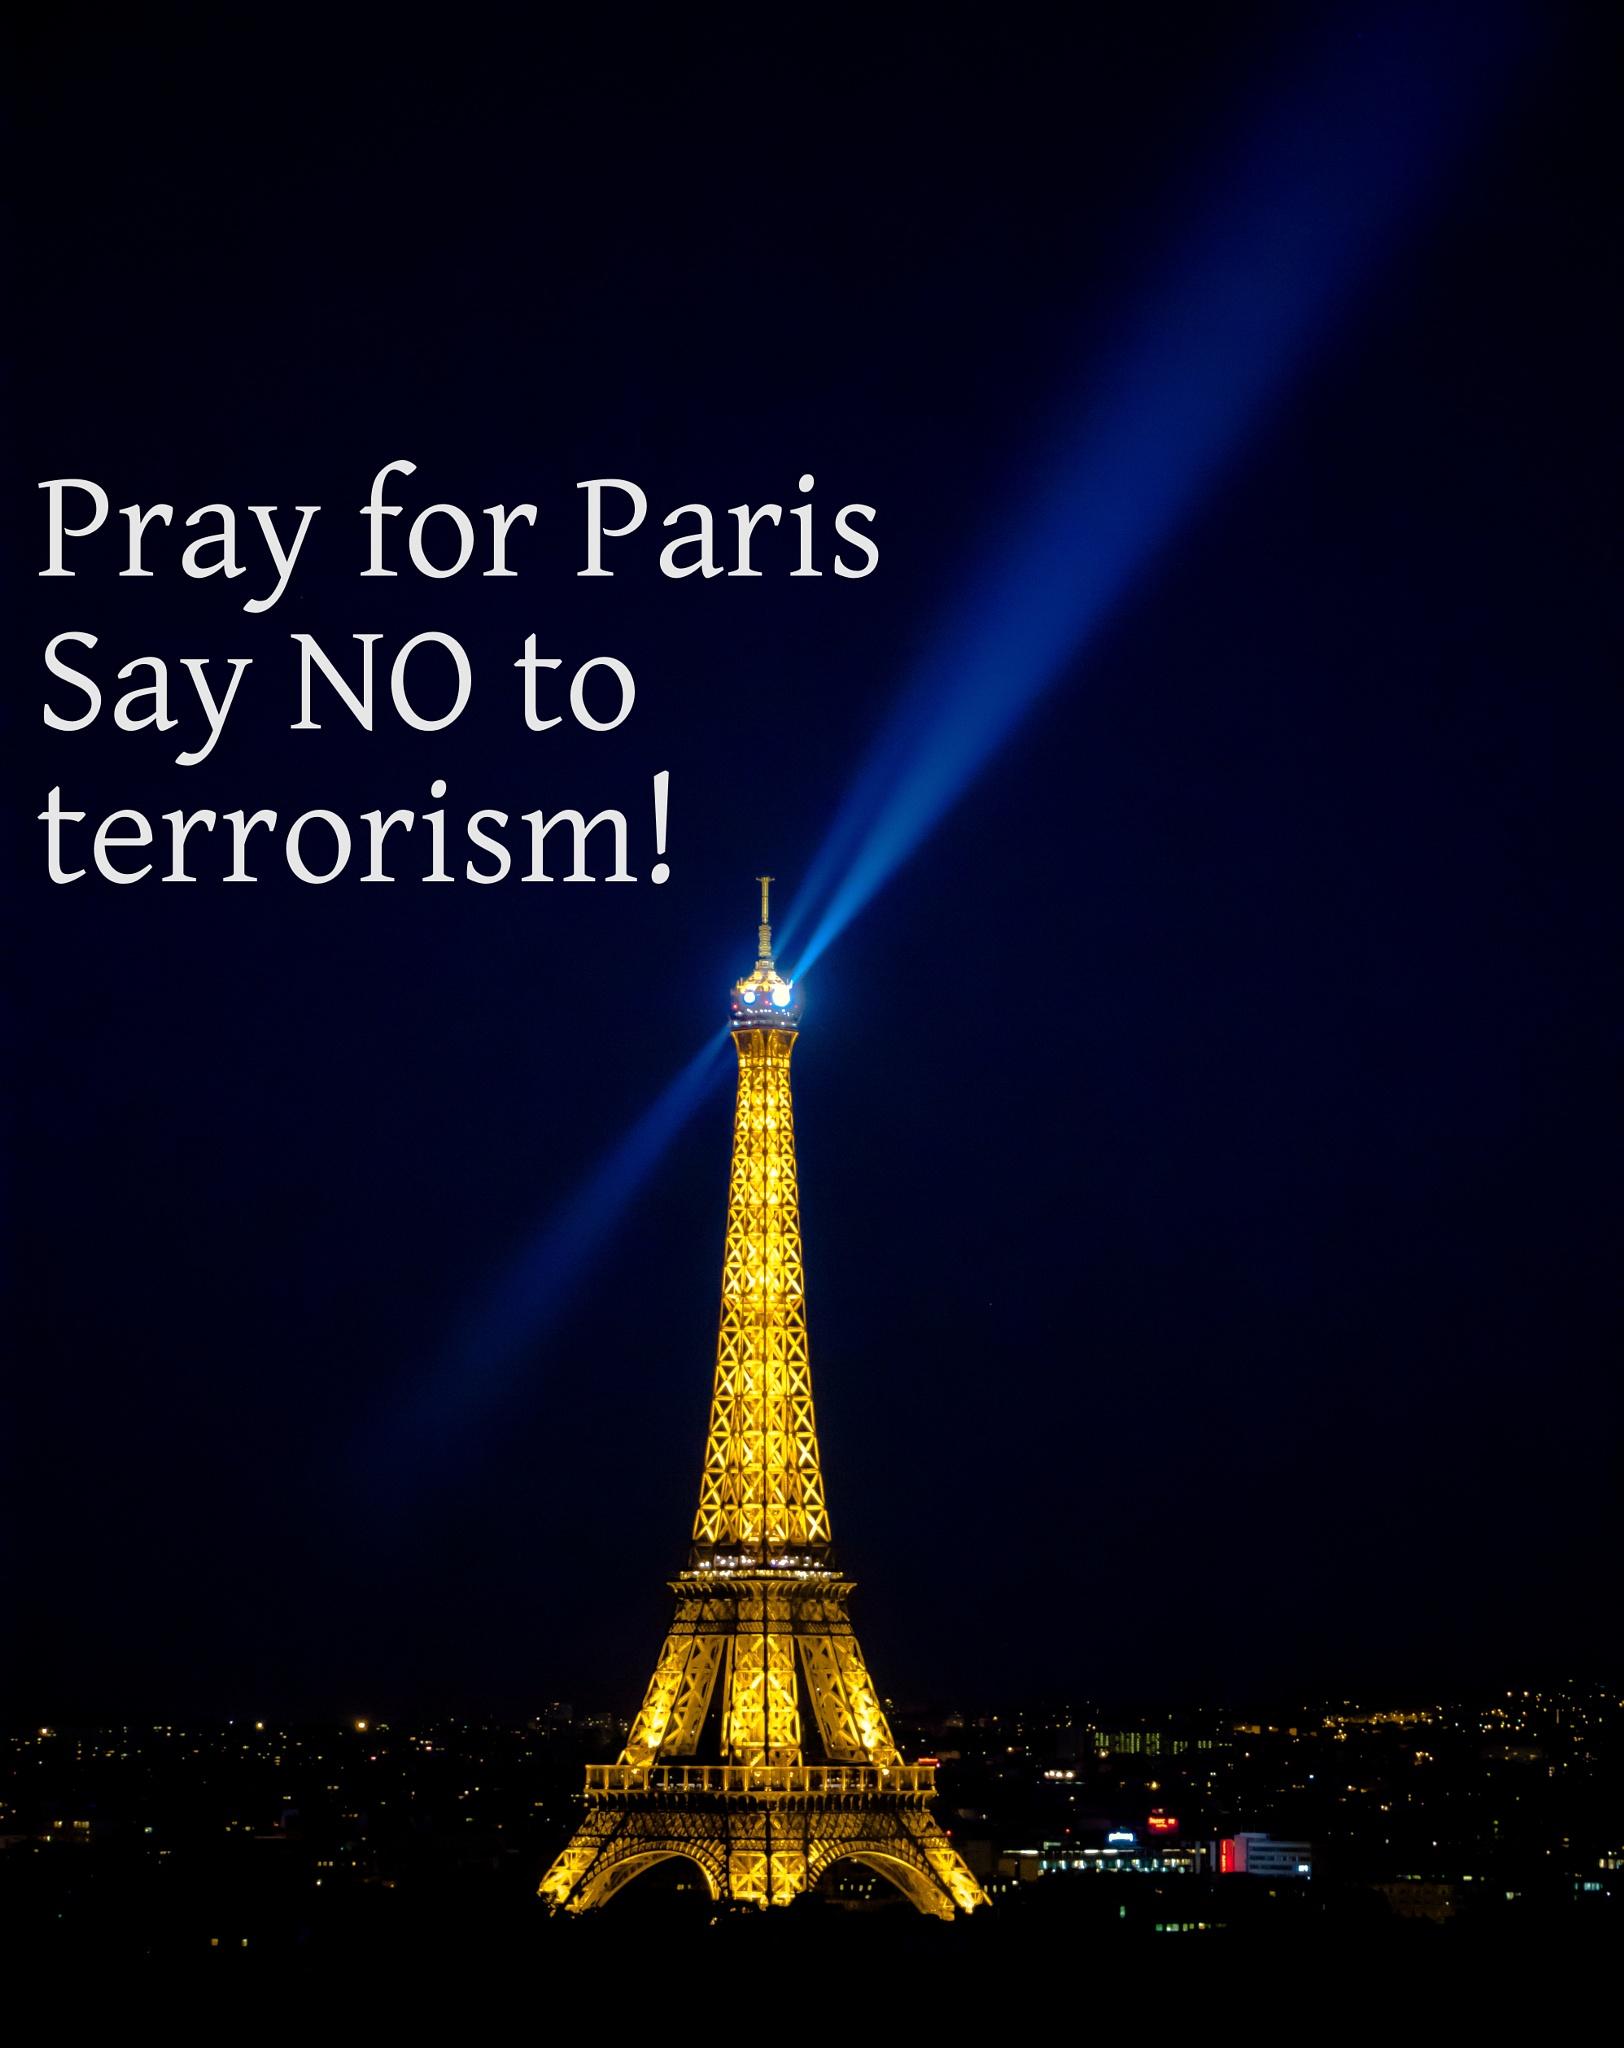 Pray for Paris - Say NO to terrorism!  by cloudwhisperer67